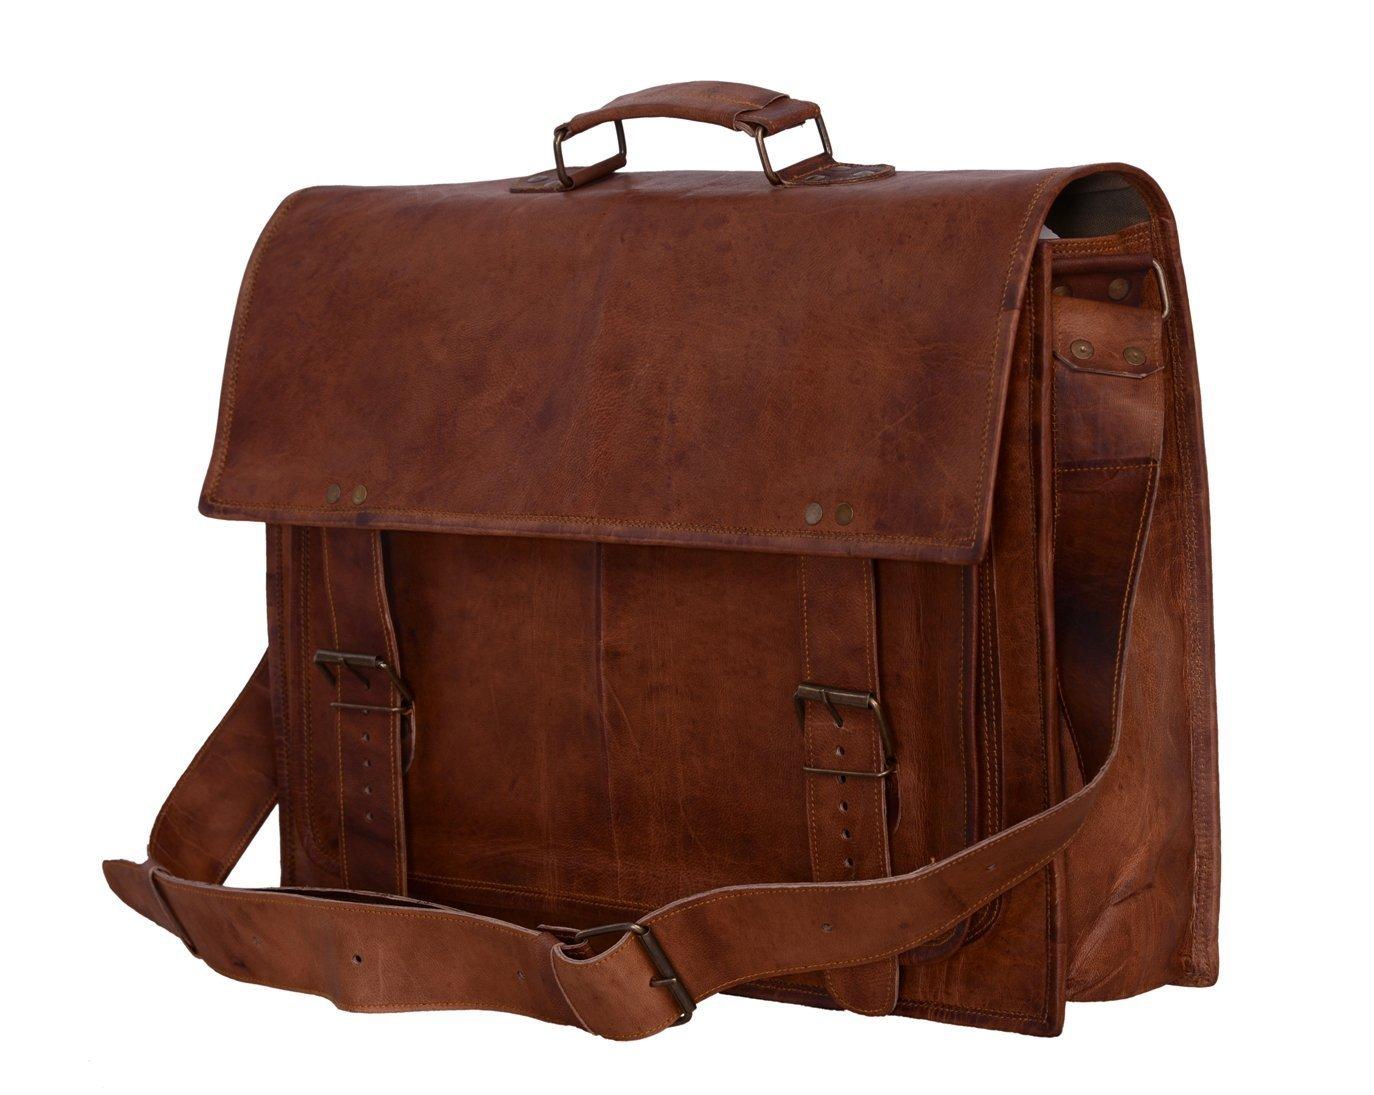 TUZECH Fine Sober Gentlemen Leather Briefcase bag Messenger Bag Laptop Bag 11 Inches by Tuzech (Image #2)